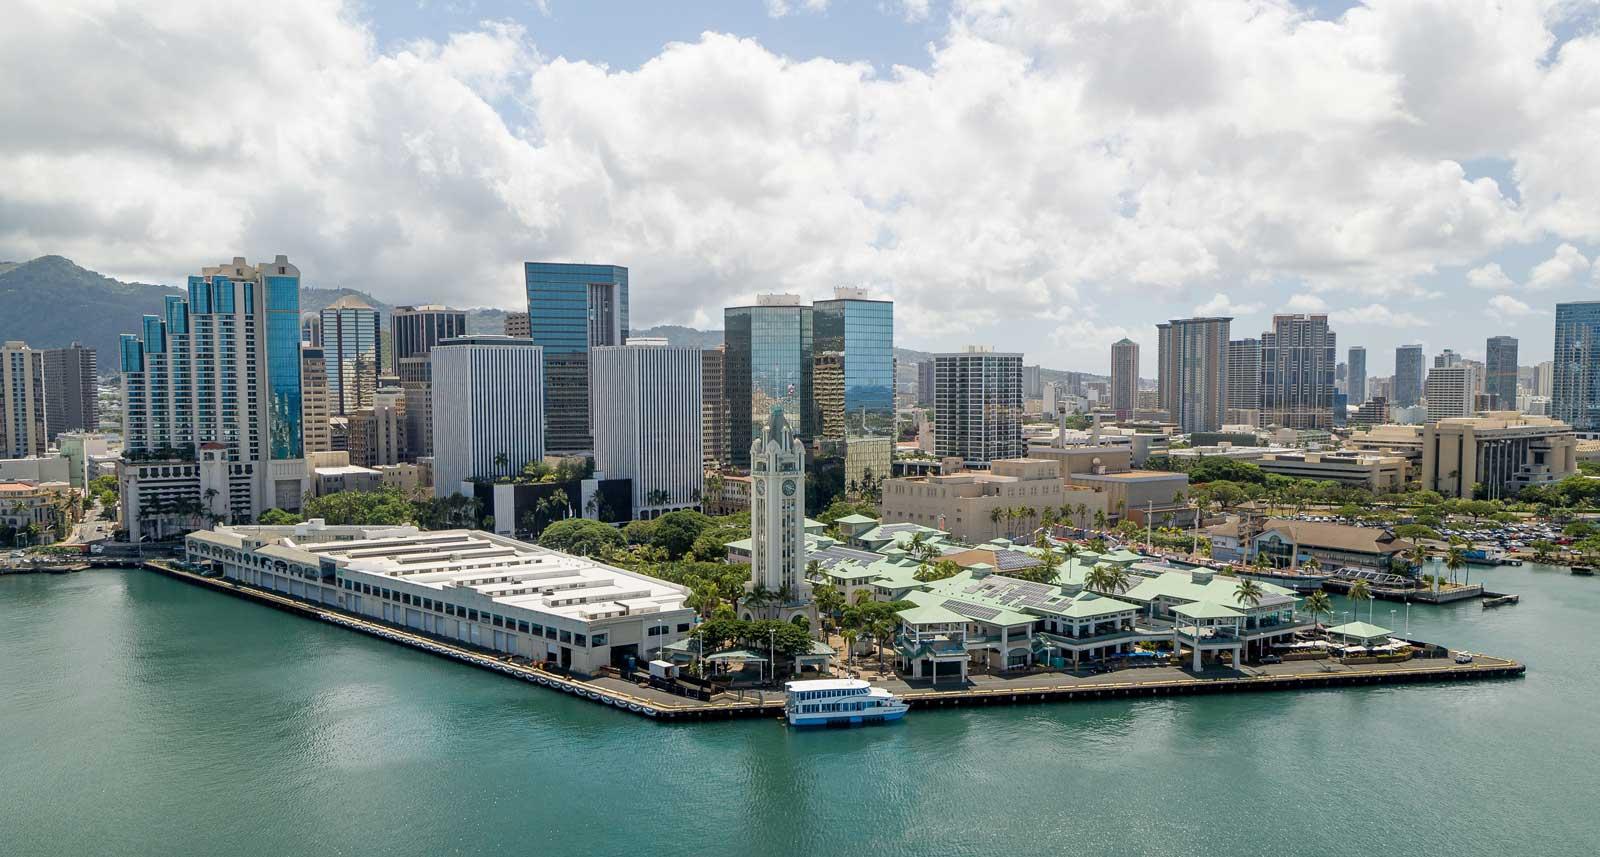 Panoramic View of HPU's Aloha Tower Marketplace